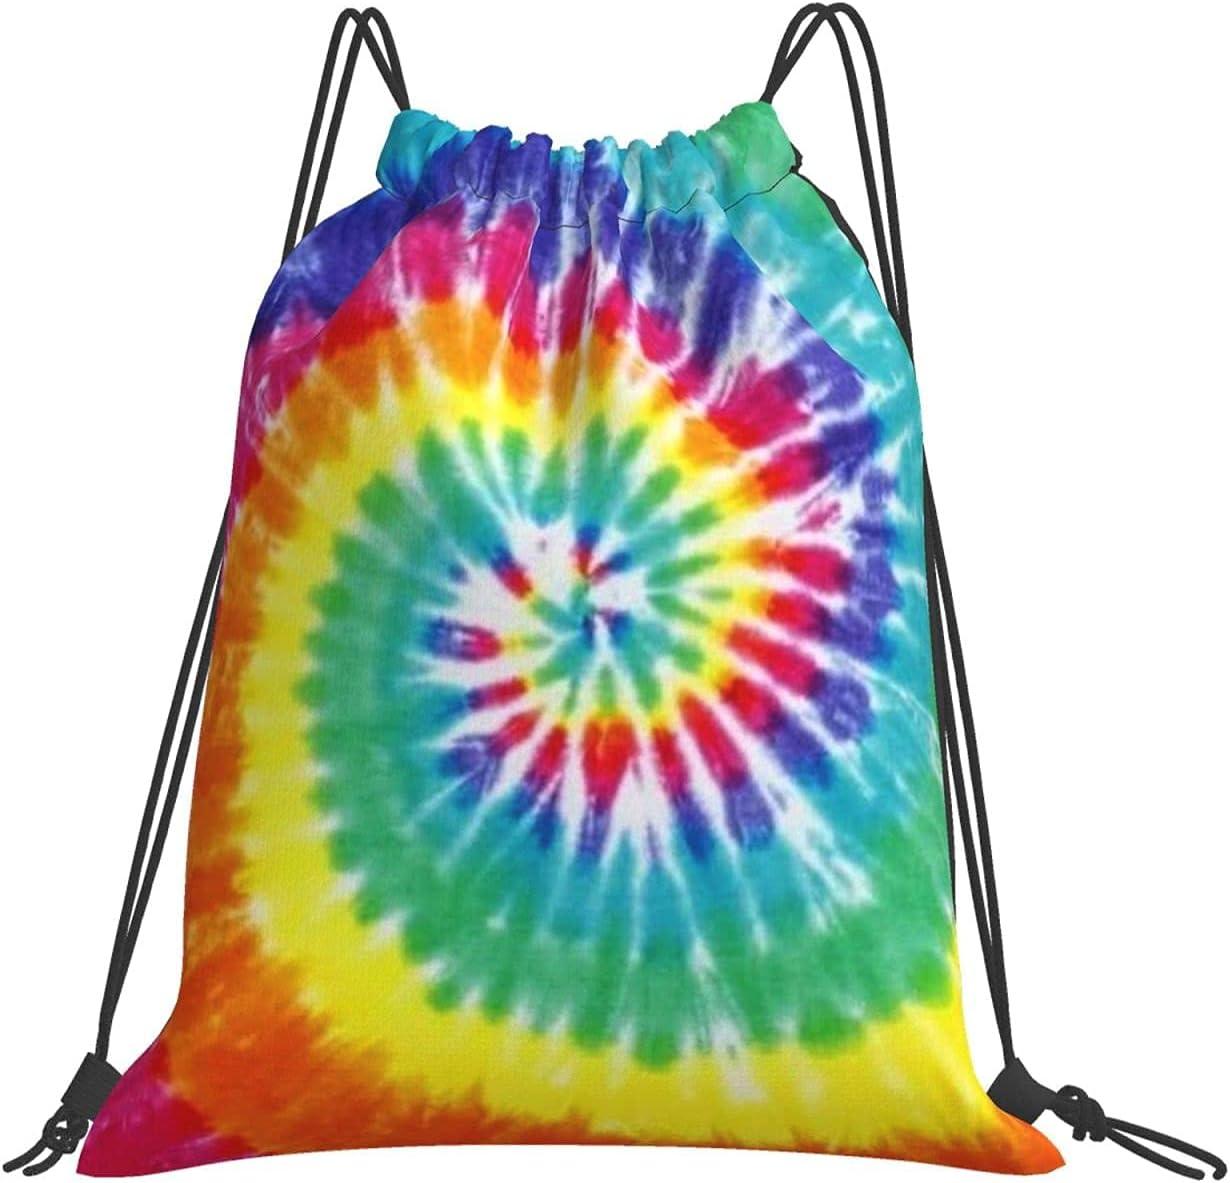 Drawstring Backpack Bags mart Tie Dye Cinch Rucksack Sport Free Shipping Cheap Bargain Gift Adjustable